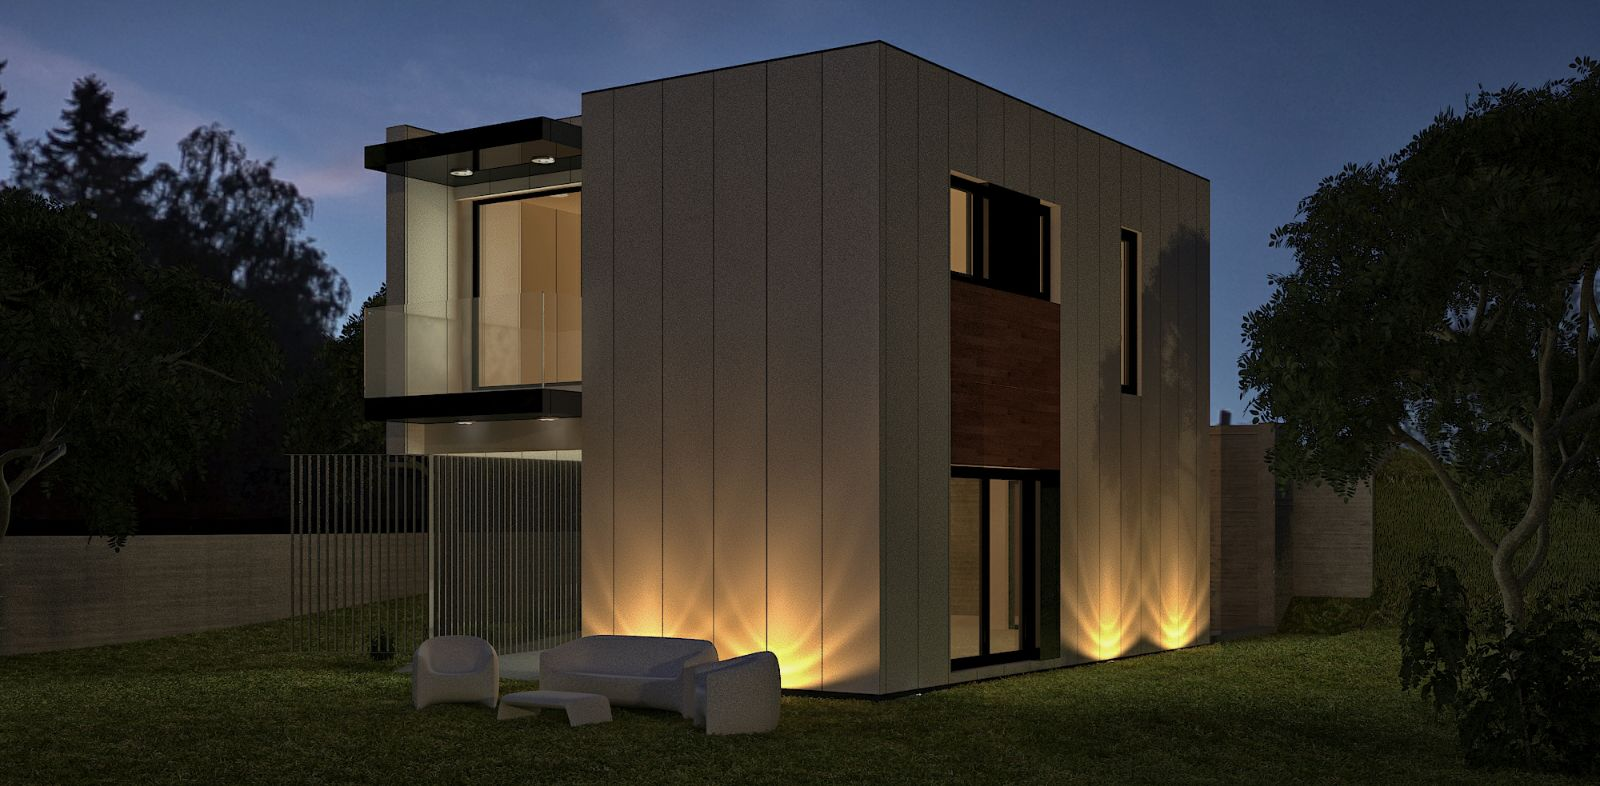 Viviendas modulares cool viviendas screenshot with - Viviendas modulares baratas ...